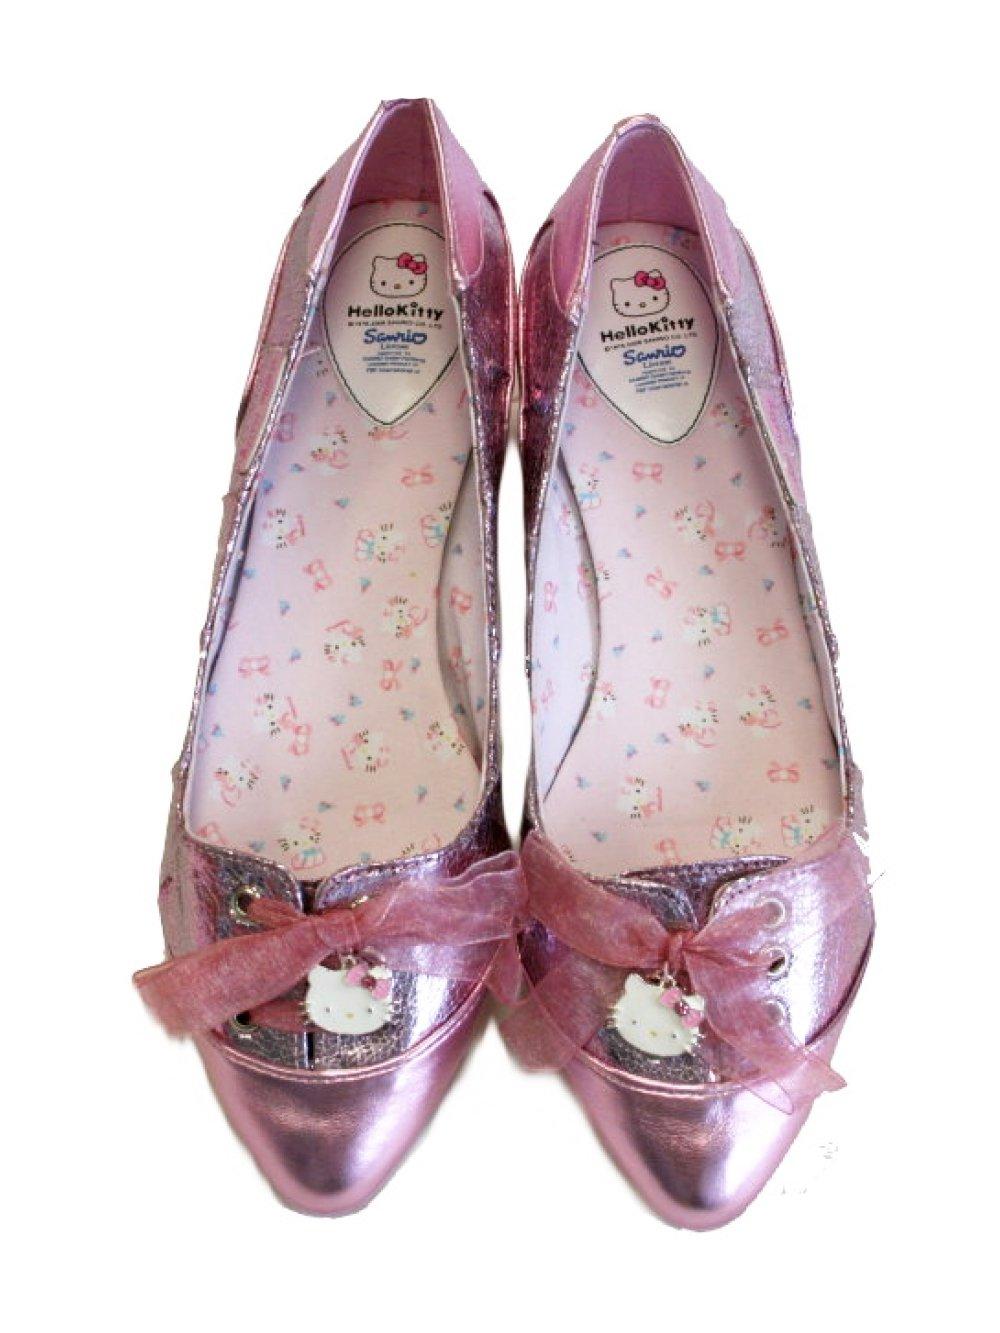 Kitty Hello Damen 2274 Schuhe Slipper Hello Kitty günstig Schuh vn0N8mOPyw